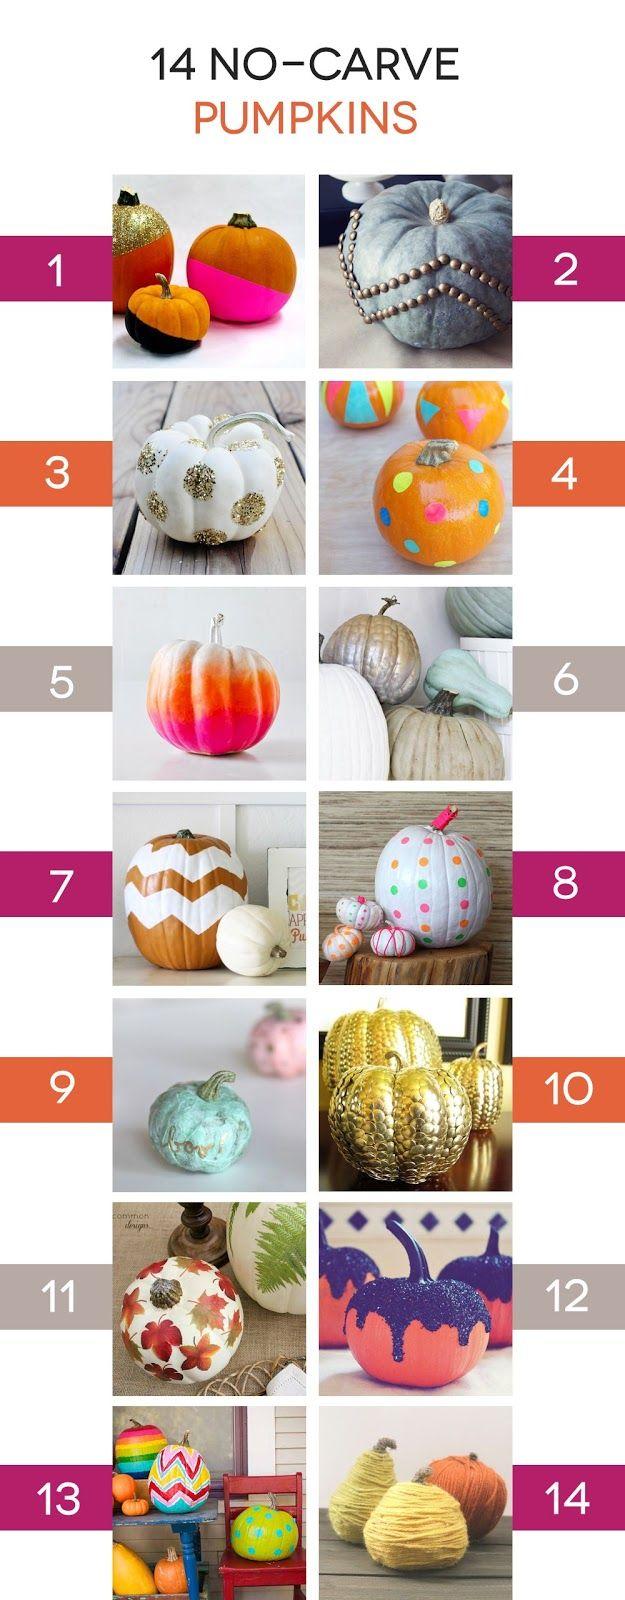 14 No-Carve Ways to Decorate Pumpkins #pumpkin #decorate #no-carve #Halloween #Fall #crafts